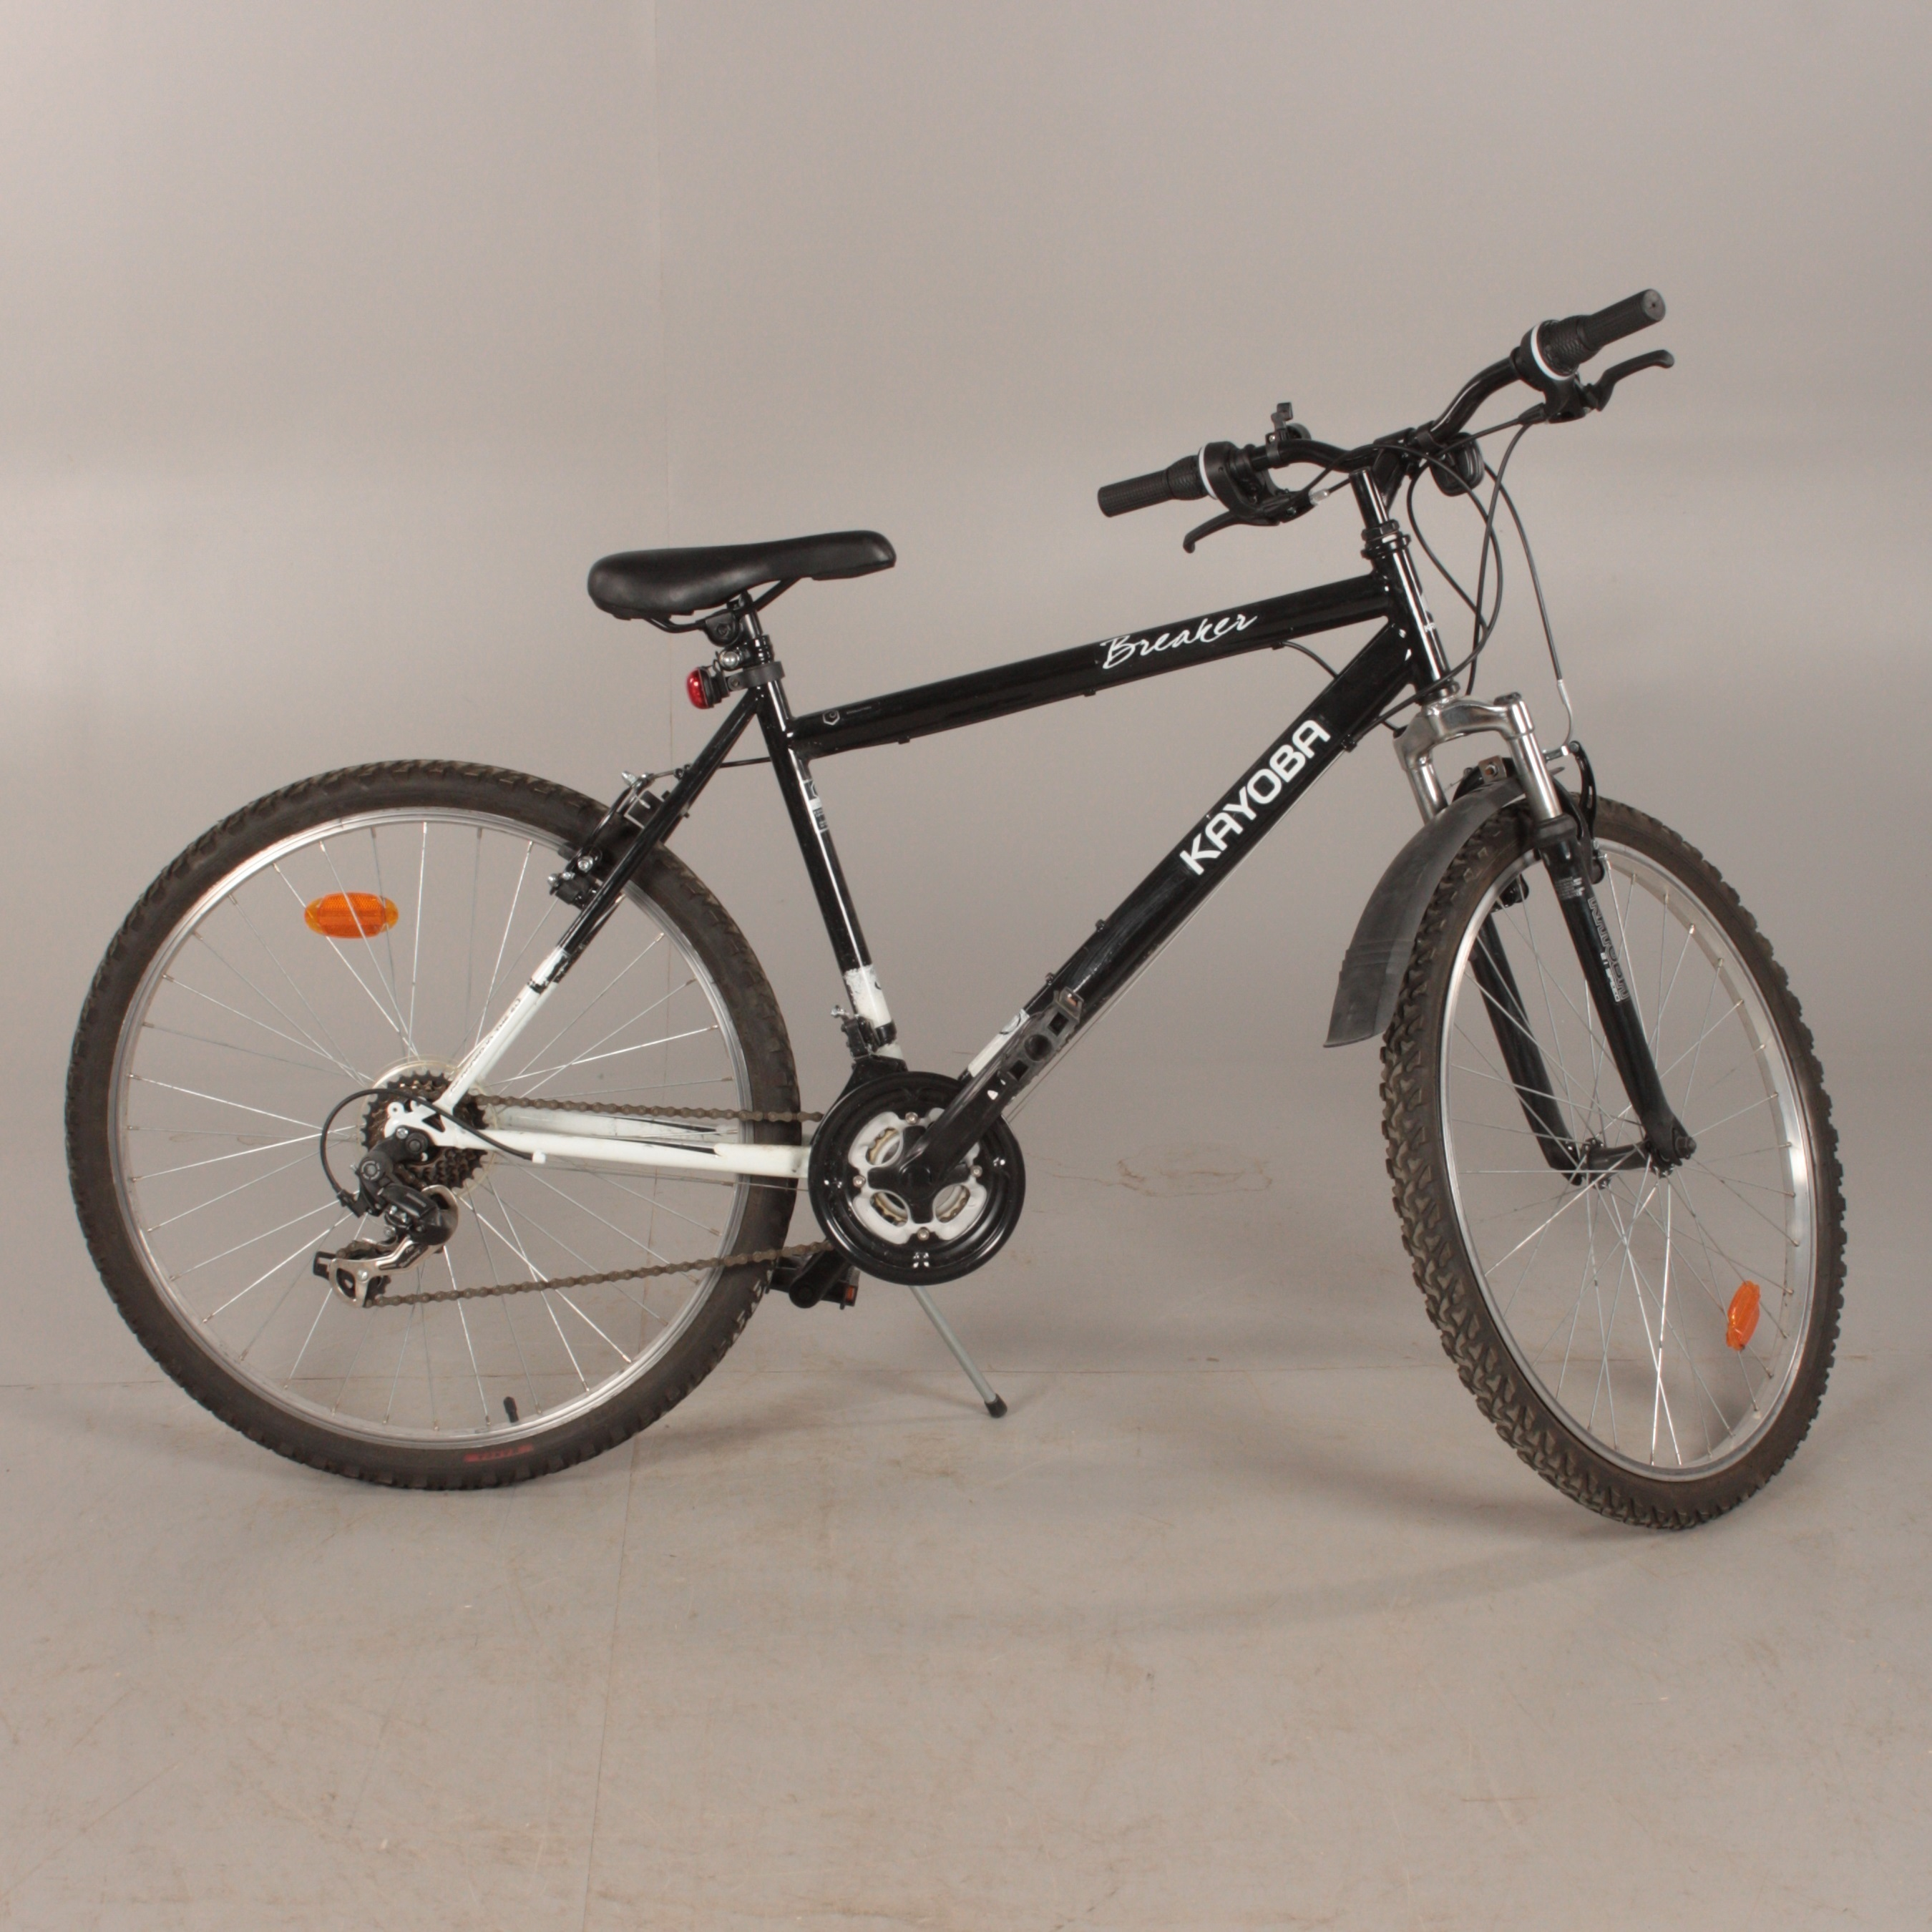 Strålande CYKEL, 21 växlar, Kayoba. Other - Bicycles & Vehicles - Auctionet NJ-53